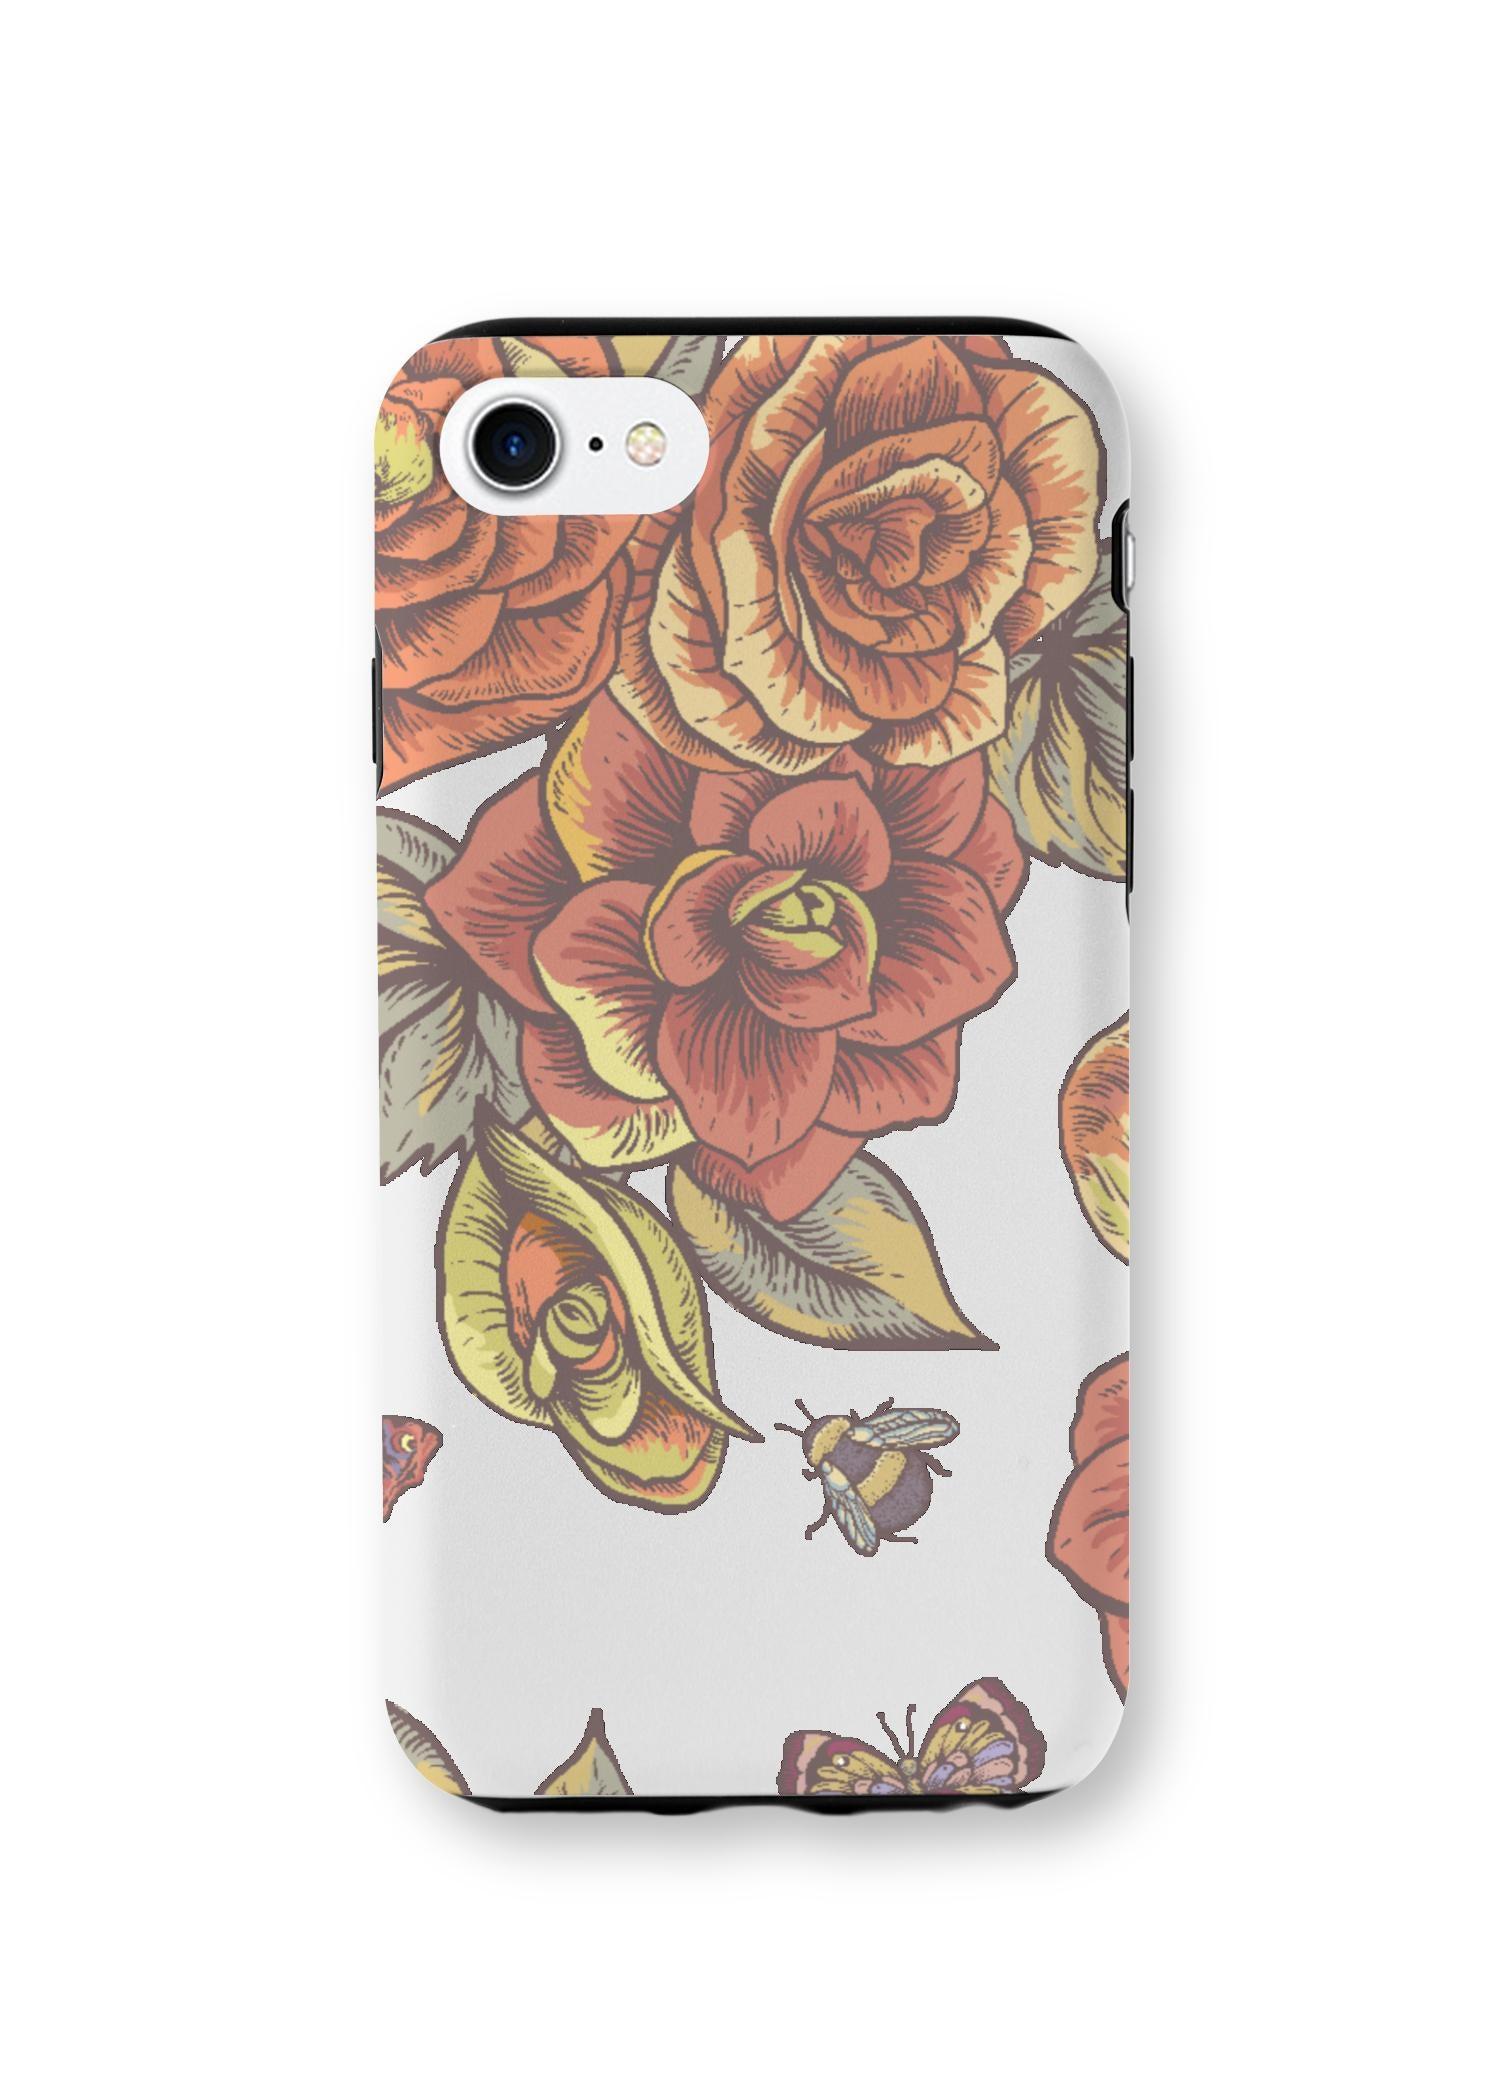 VIDA iPhone Case - Vintage Rose Garden by VIDA Original Artist  - Size: iPhone 7/8 / Tough